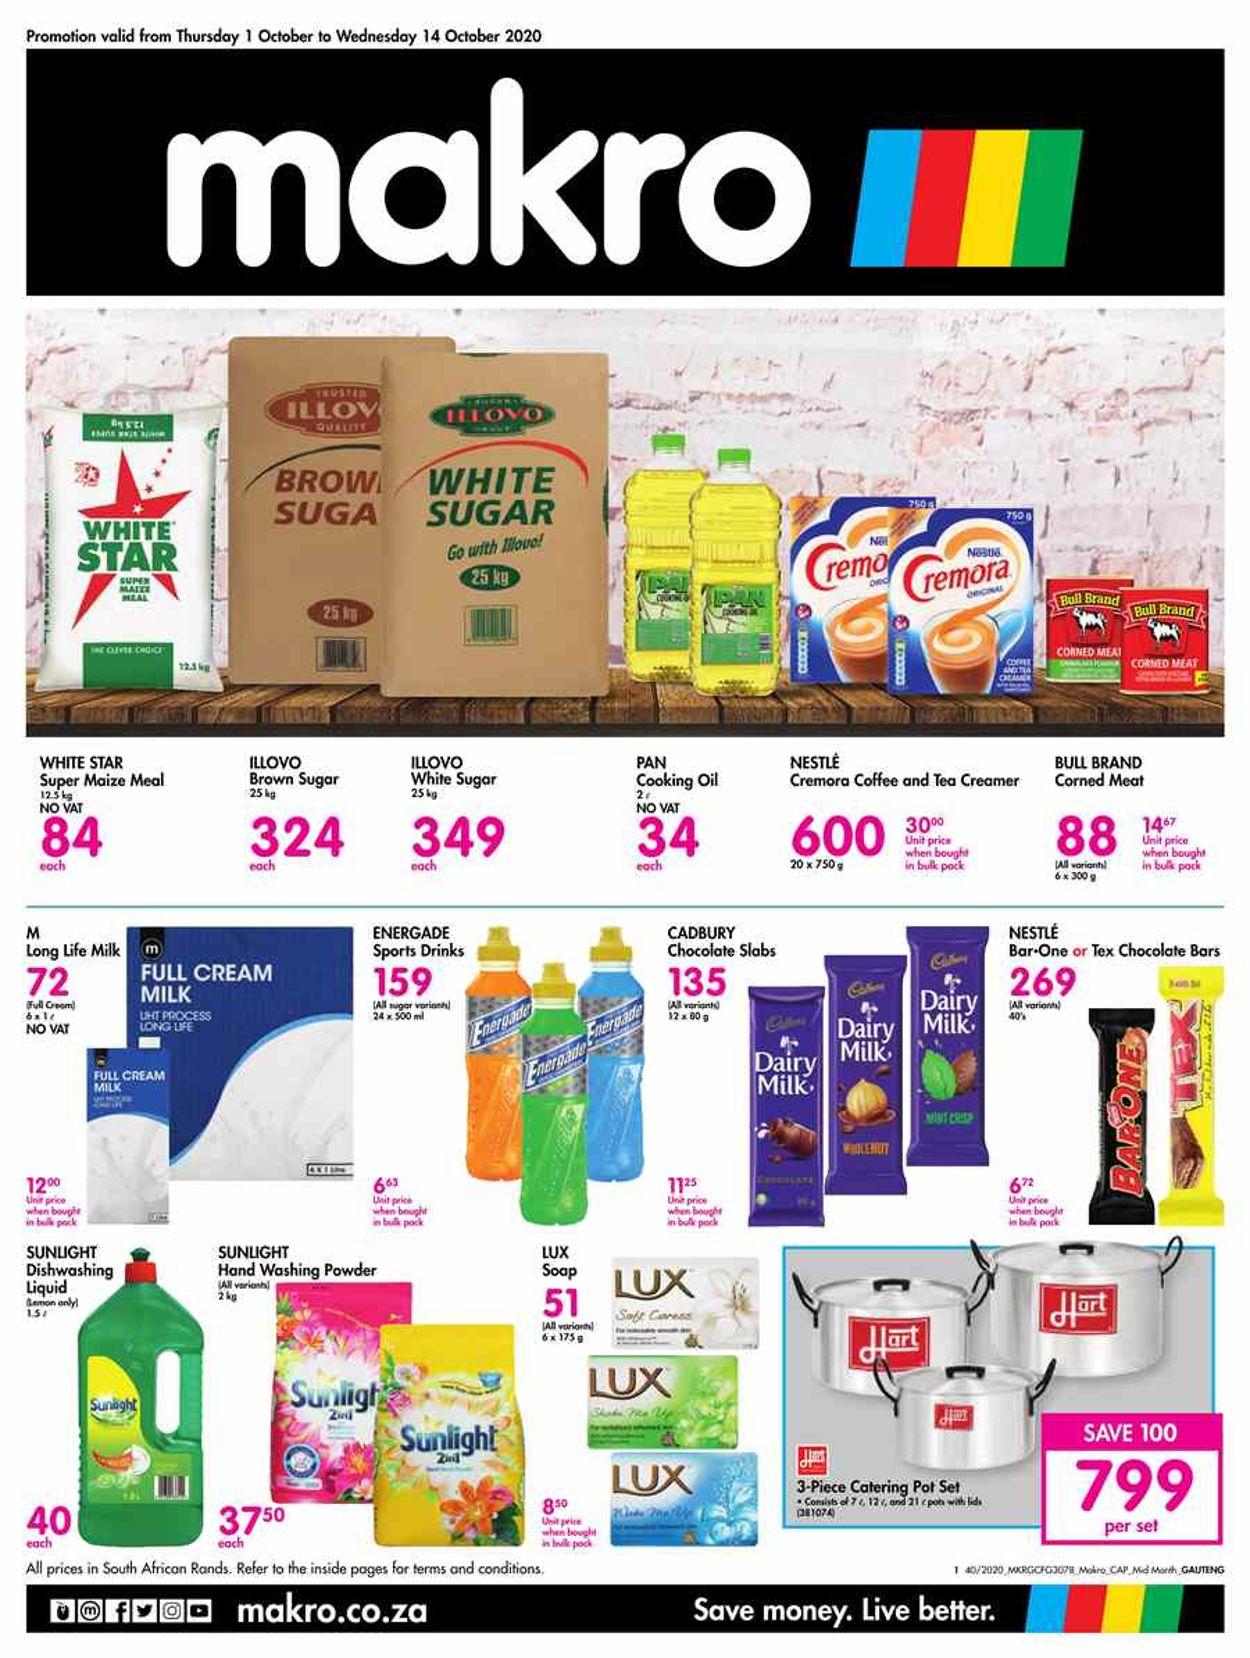 Makro Catalogue - 2020/10/01-2020/10/14